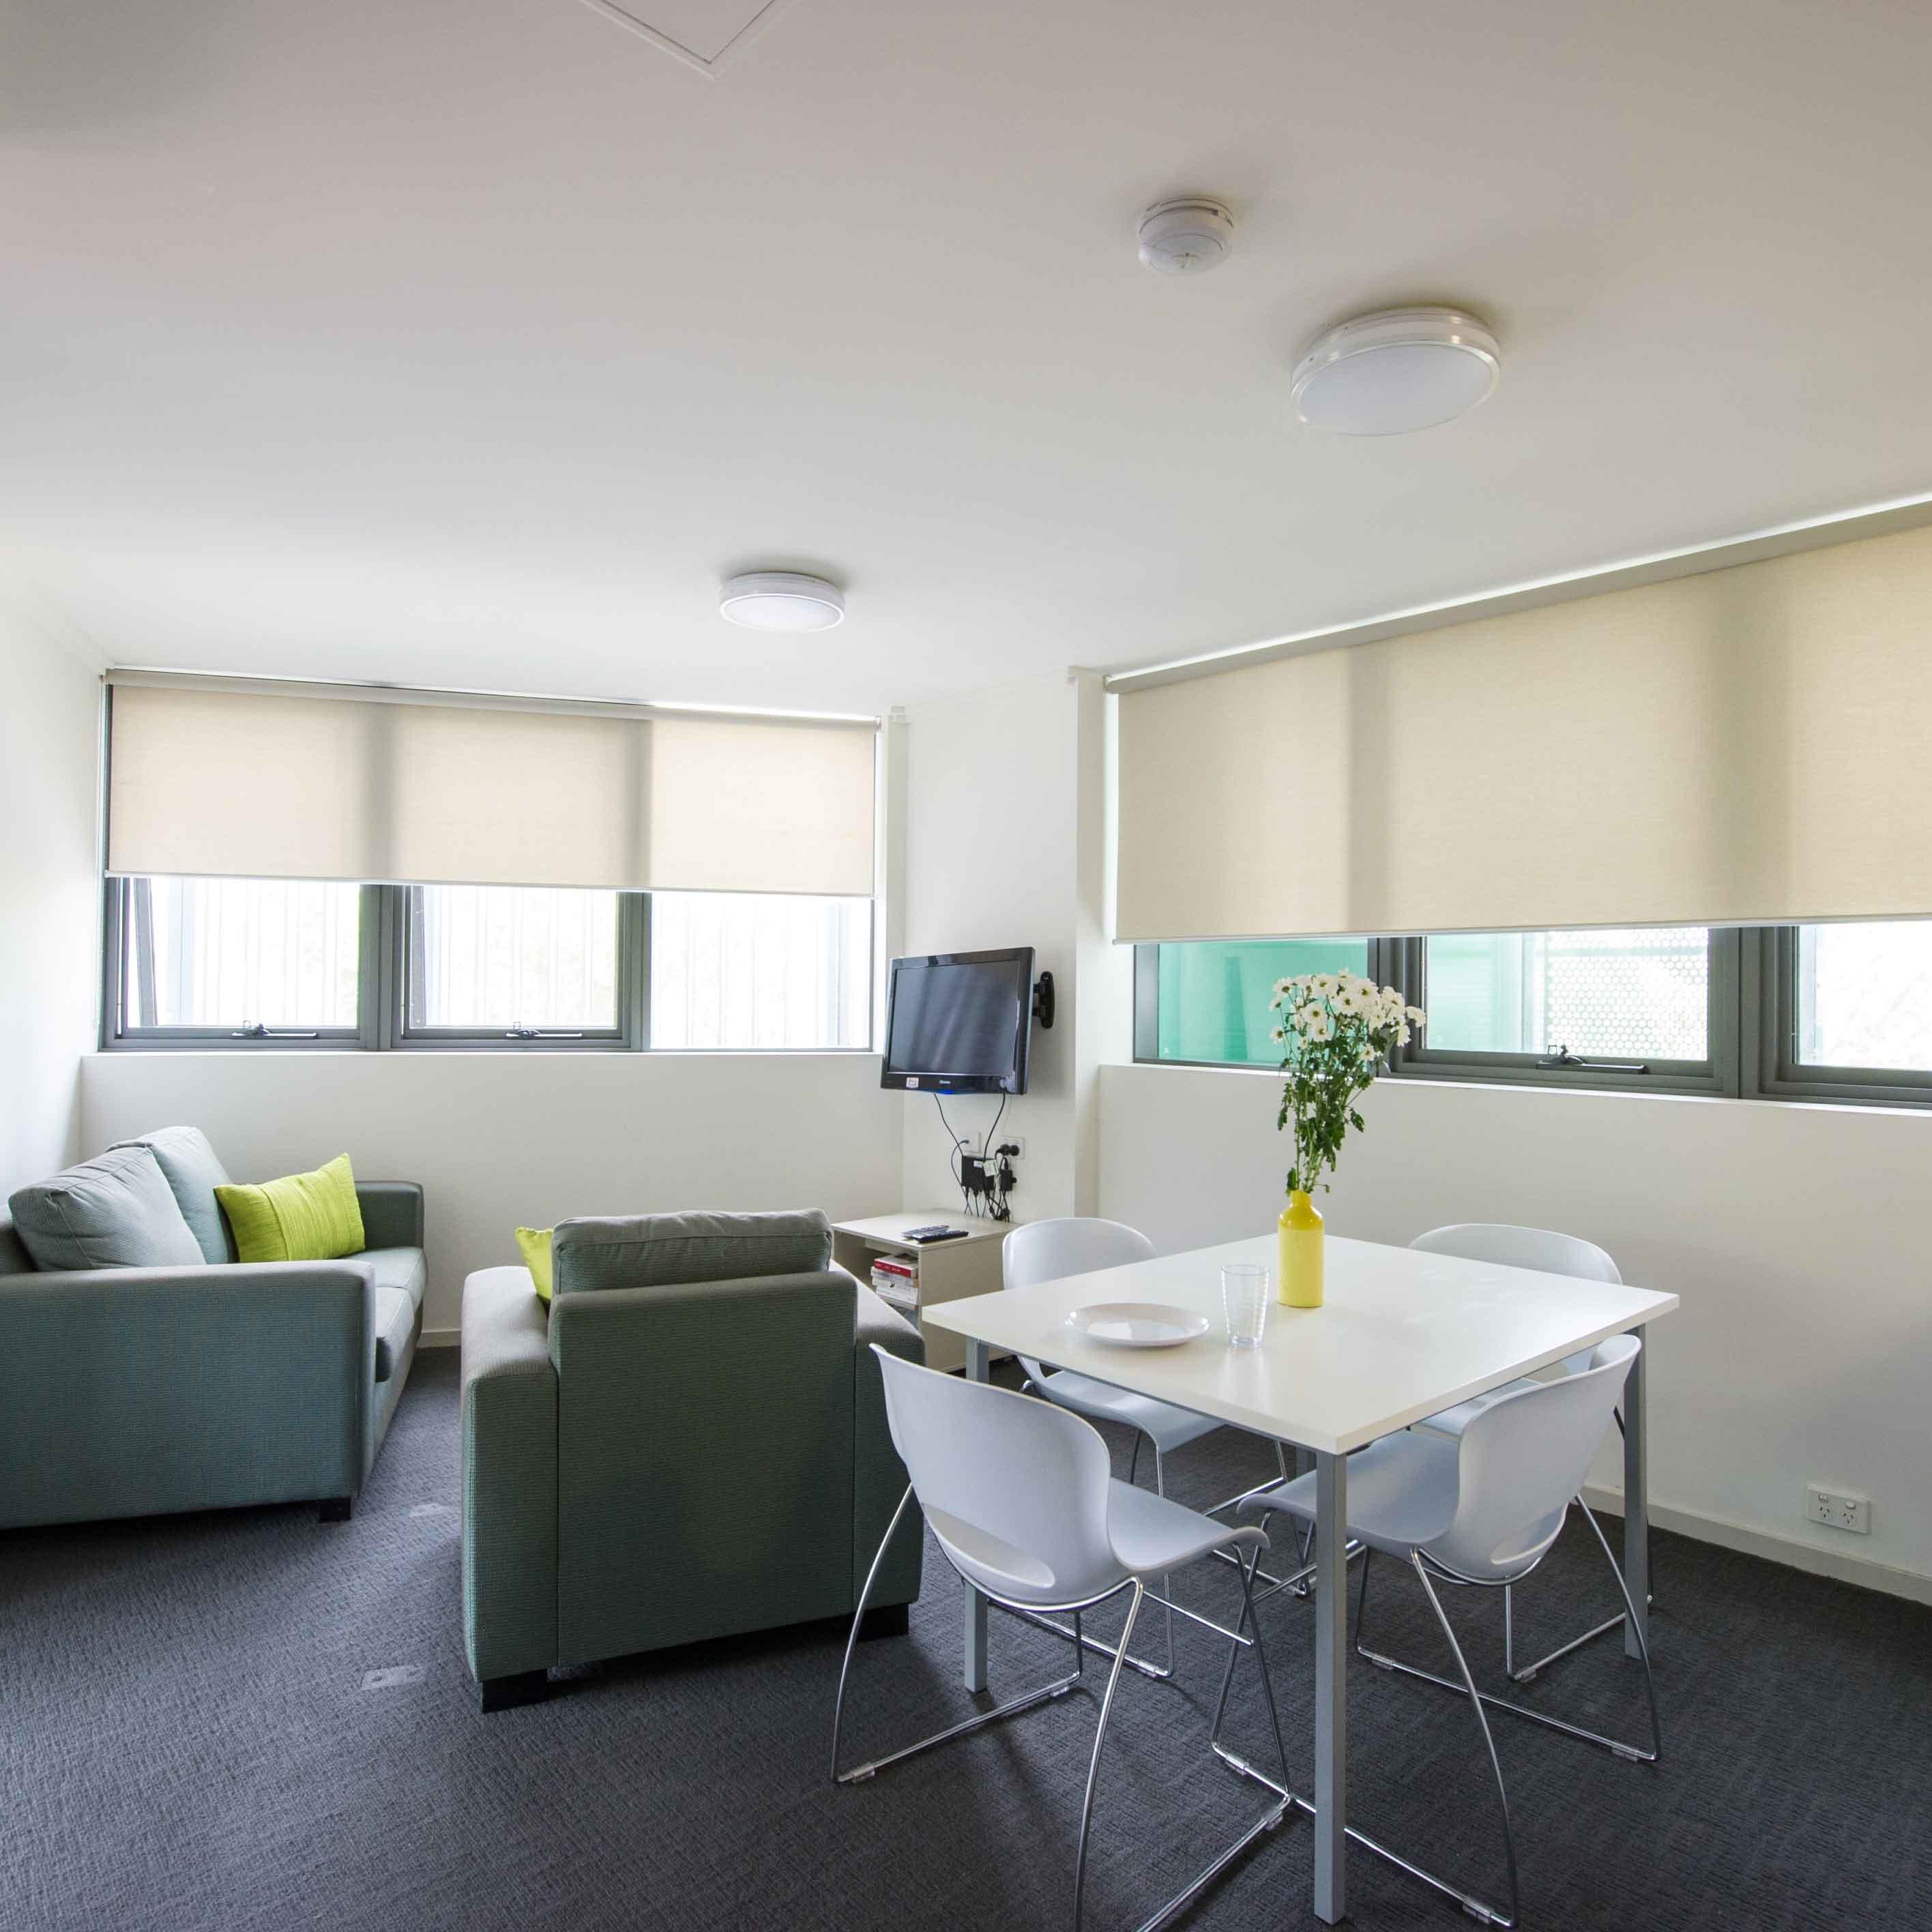 UniLodge @ ANU Warrambul Lodge 5 Bedroom Apartment